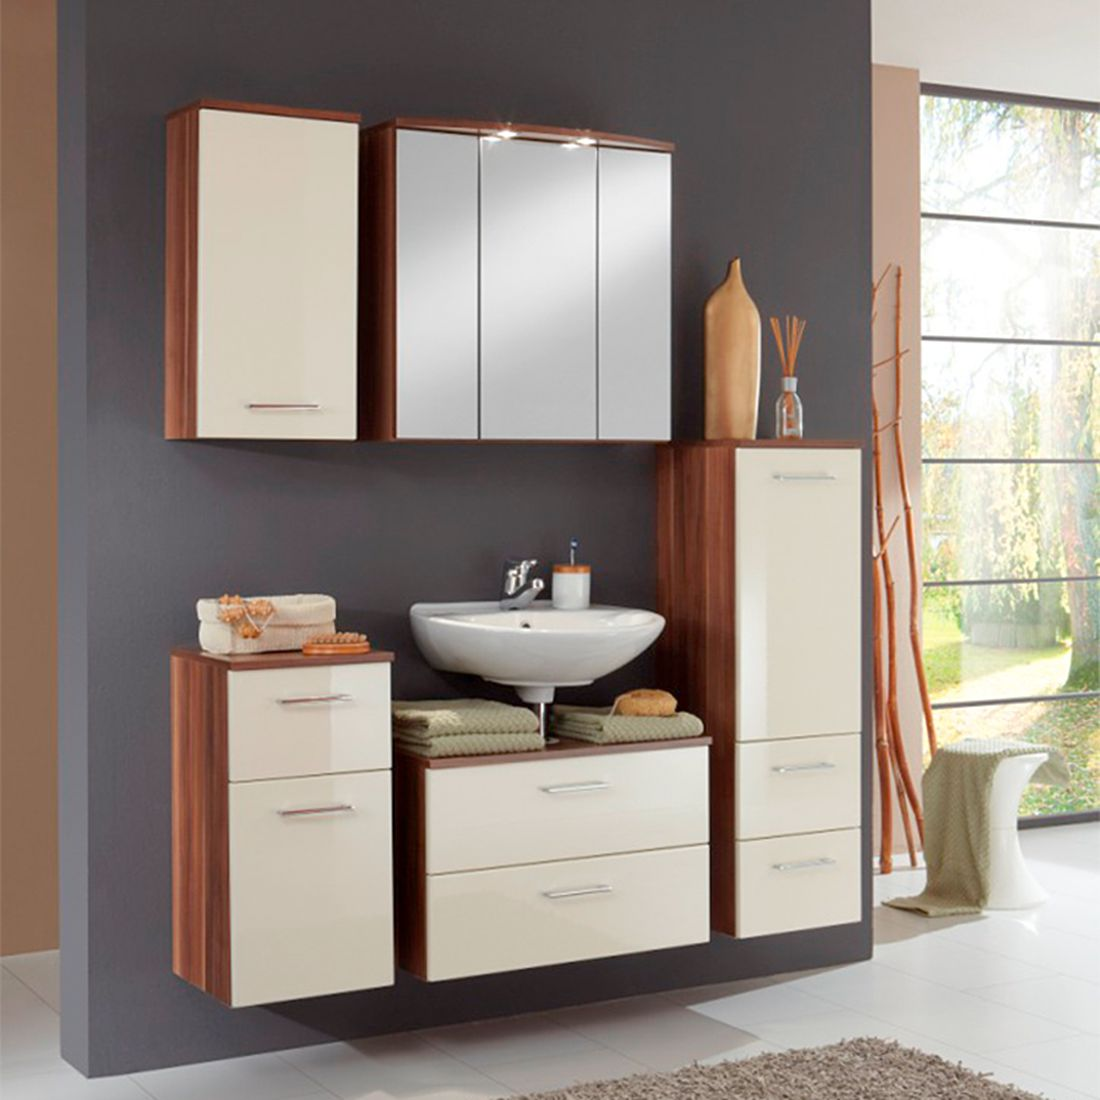 Home 24 - Ensemble de meubles, 5 éléments marino - imitation noyer / crème, giessbach